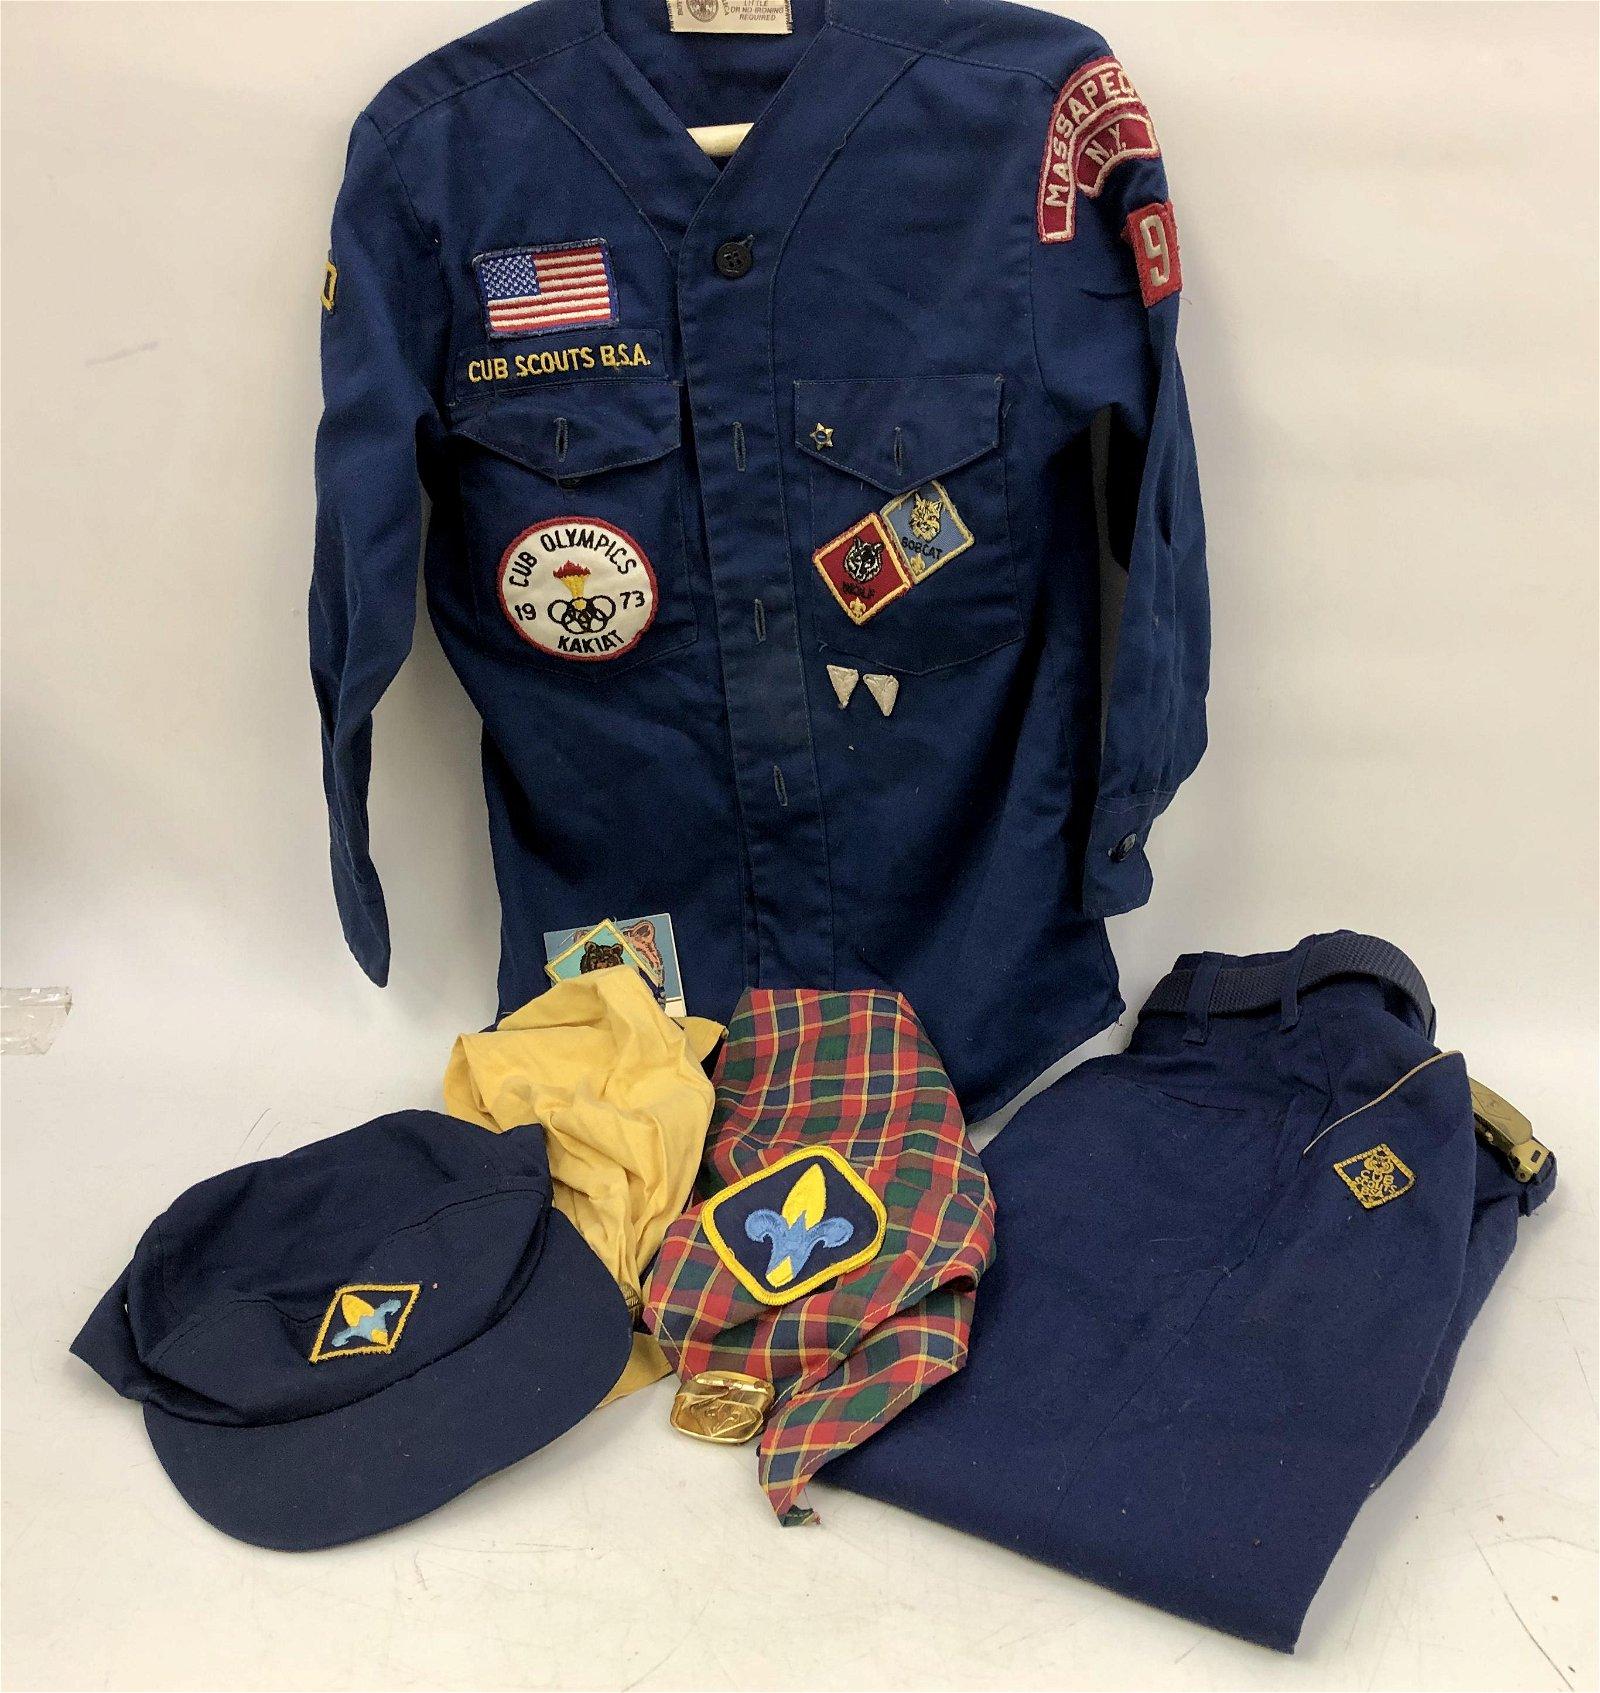 Lot of 7 Boy Scout Items, Shirt, Pants, Hat, Badge